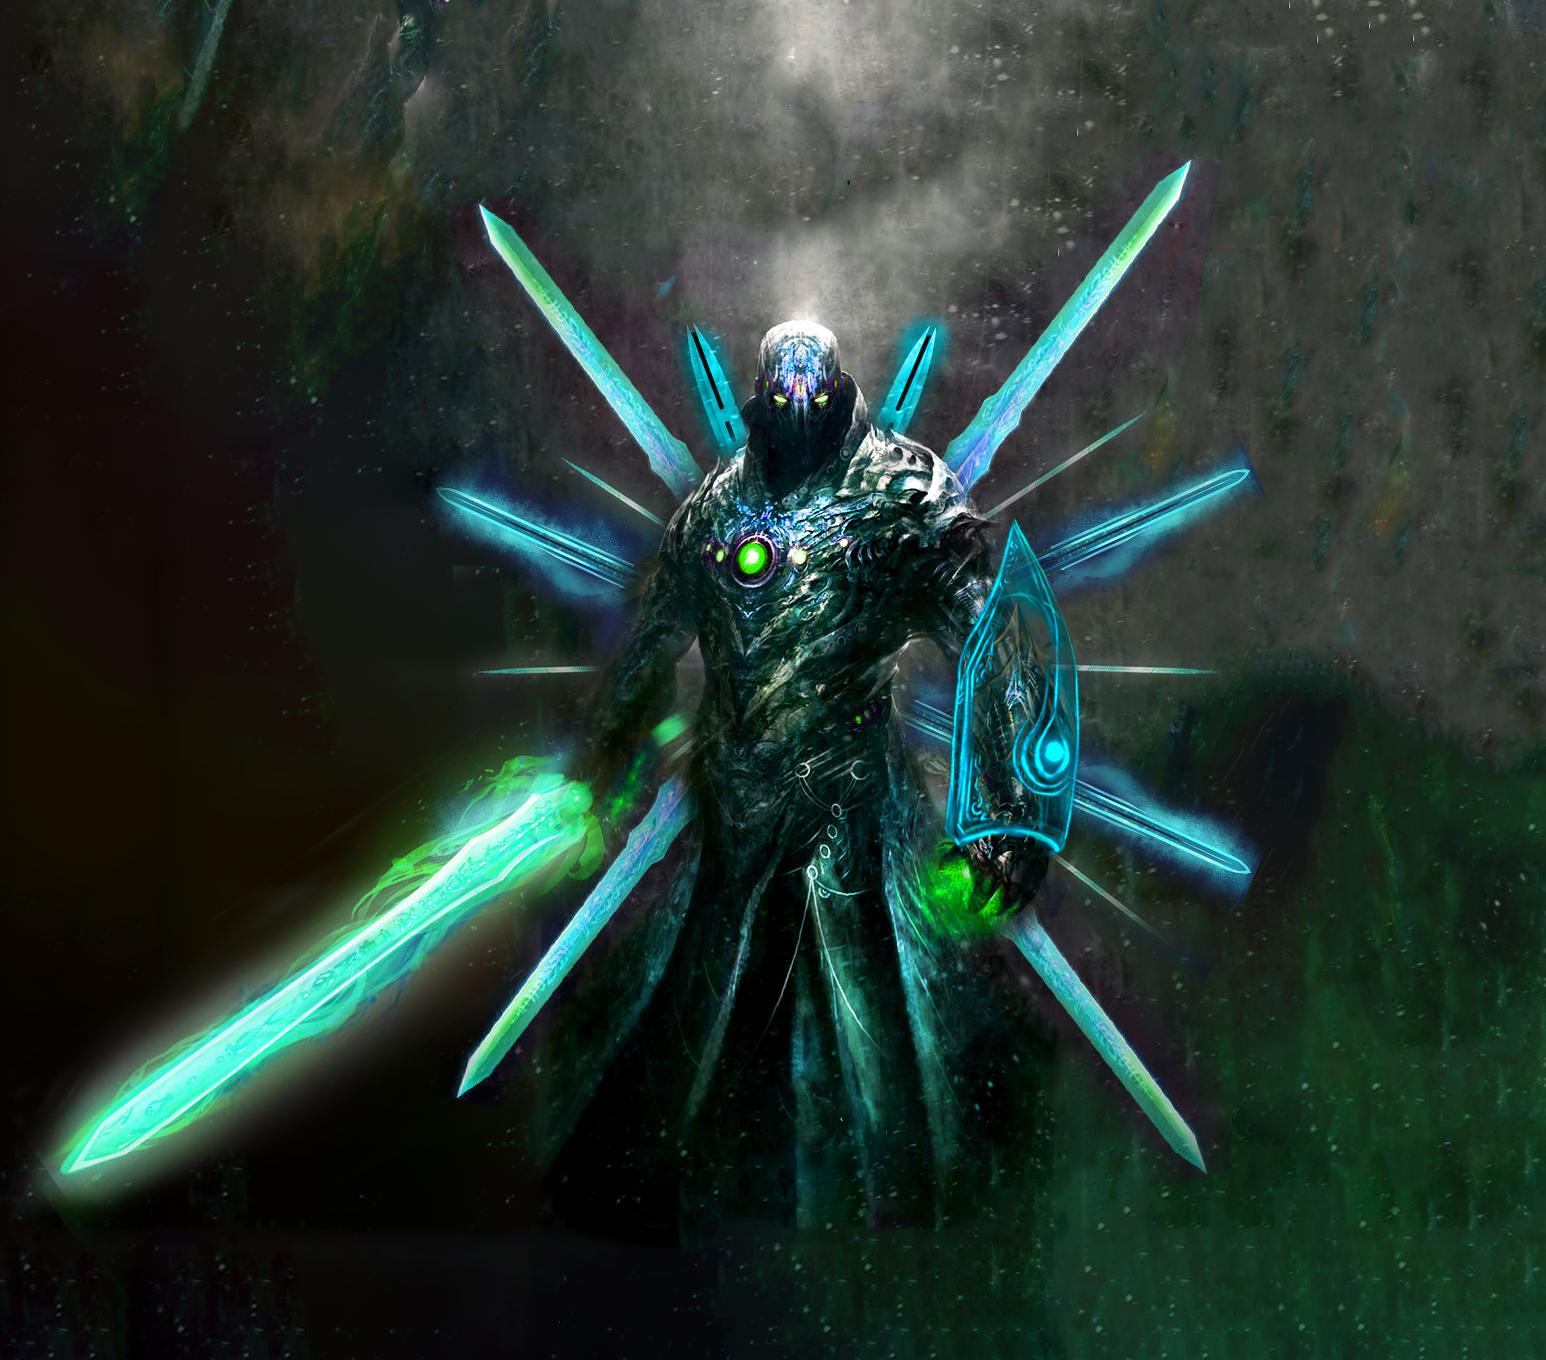 Tempest_-full_psychic_armory.jpg